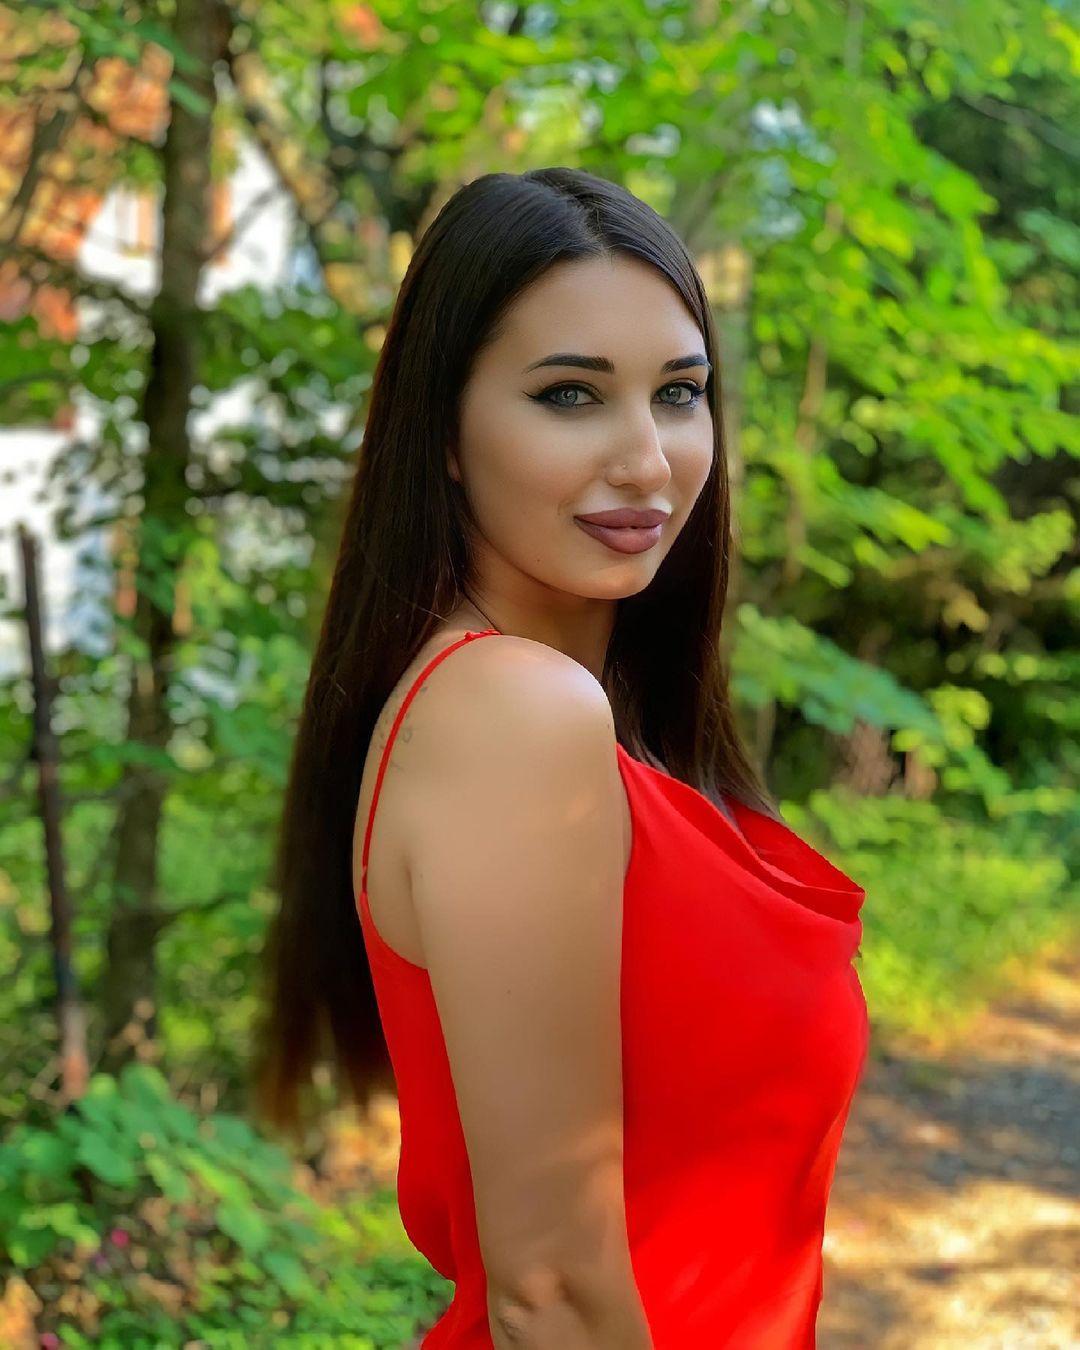 Diana-Mihajlovic-Wallpapers-Insta-Fit-Bio-21